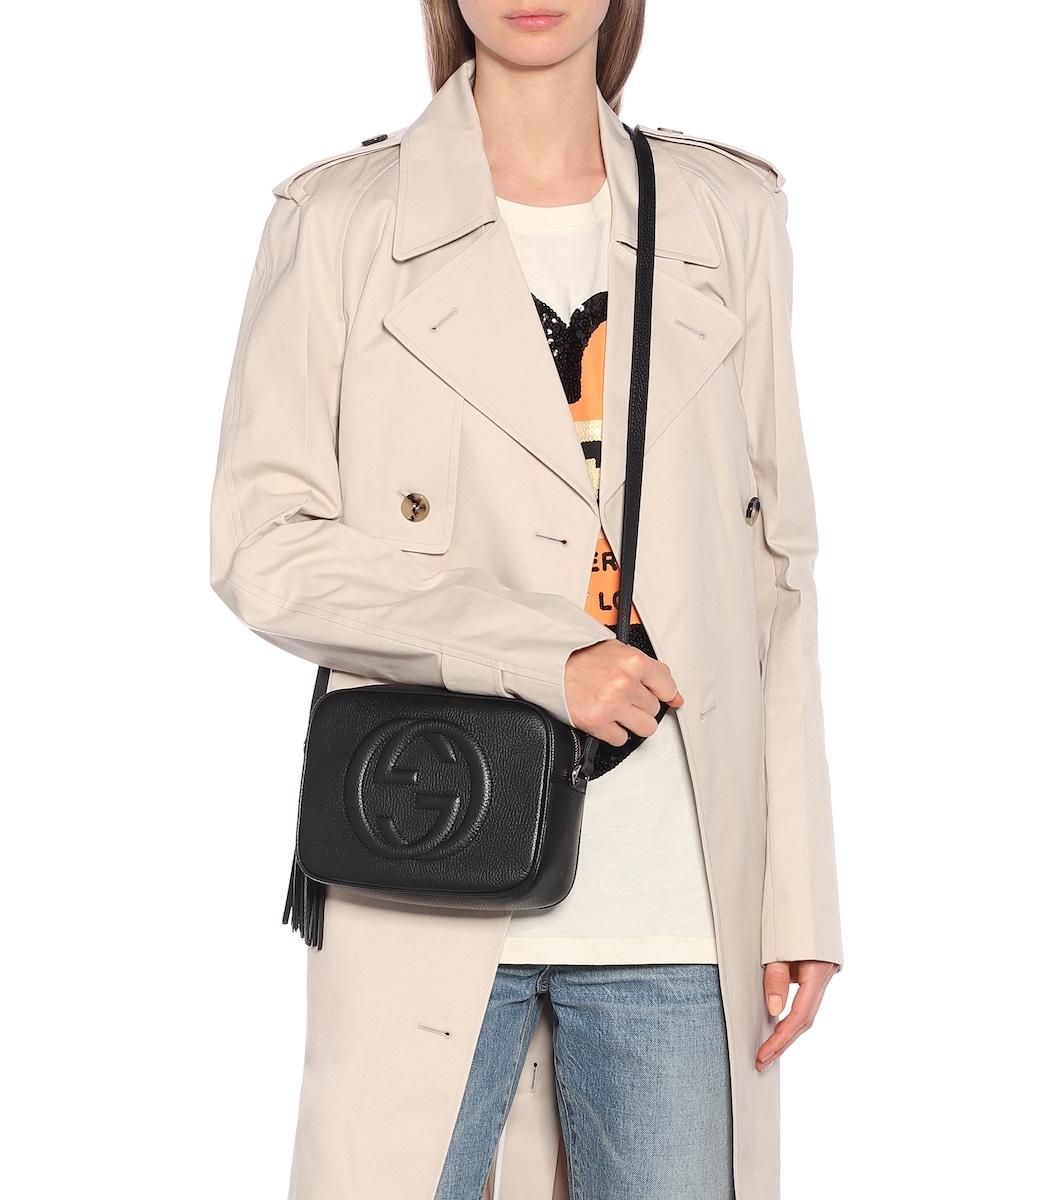 ff3a5ad1d32fc7 Disco Bag Soho Leather Crossbody Bag - Gucci | mytheresa.com